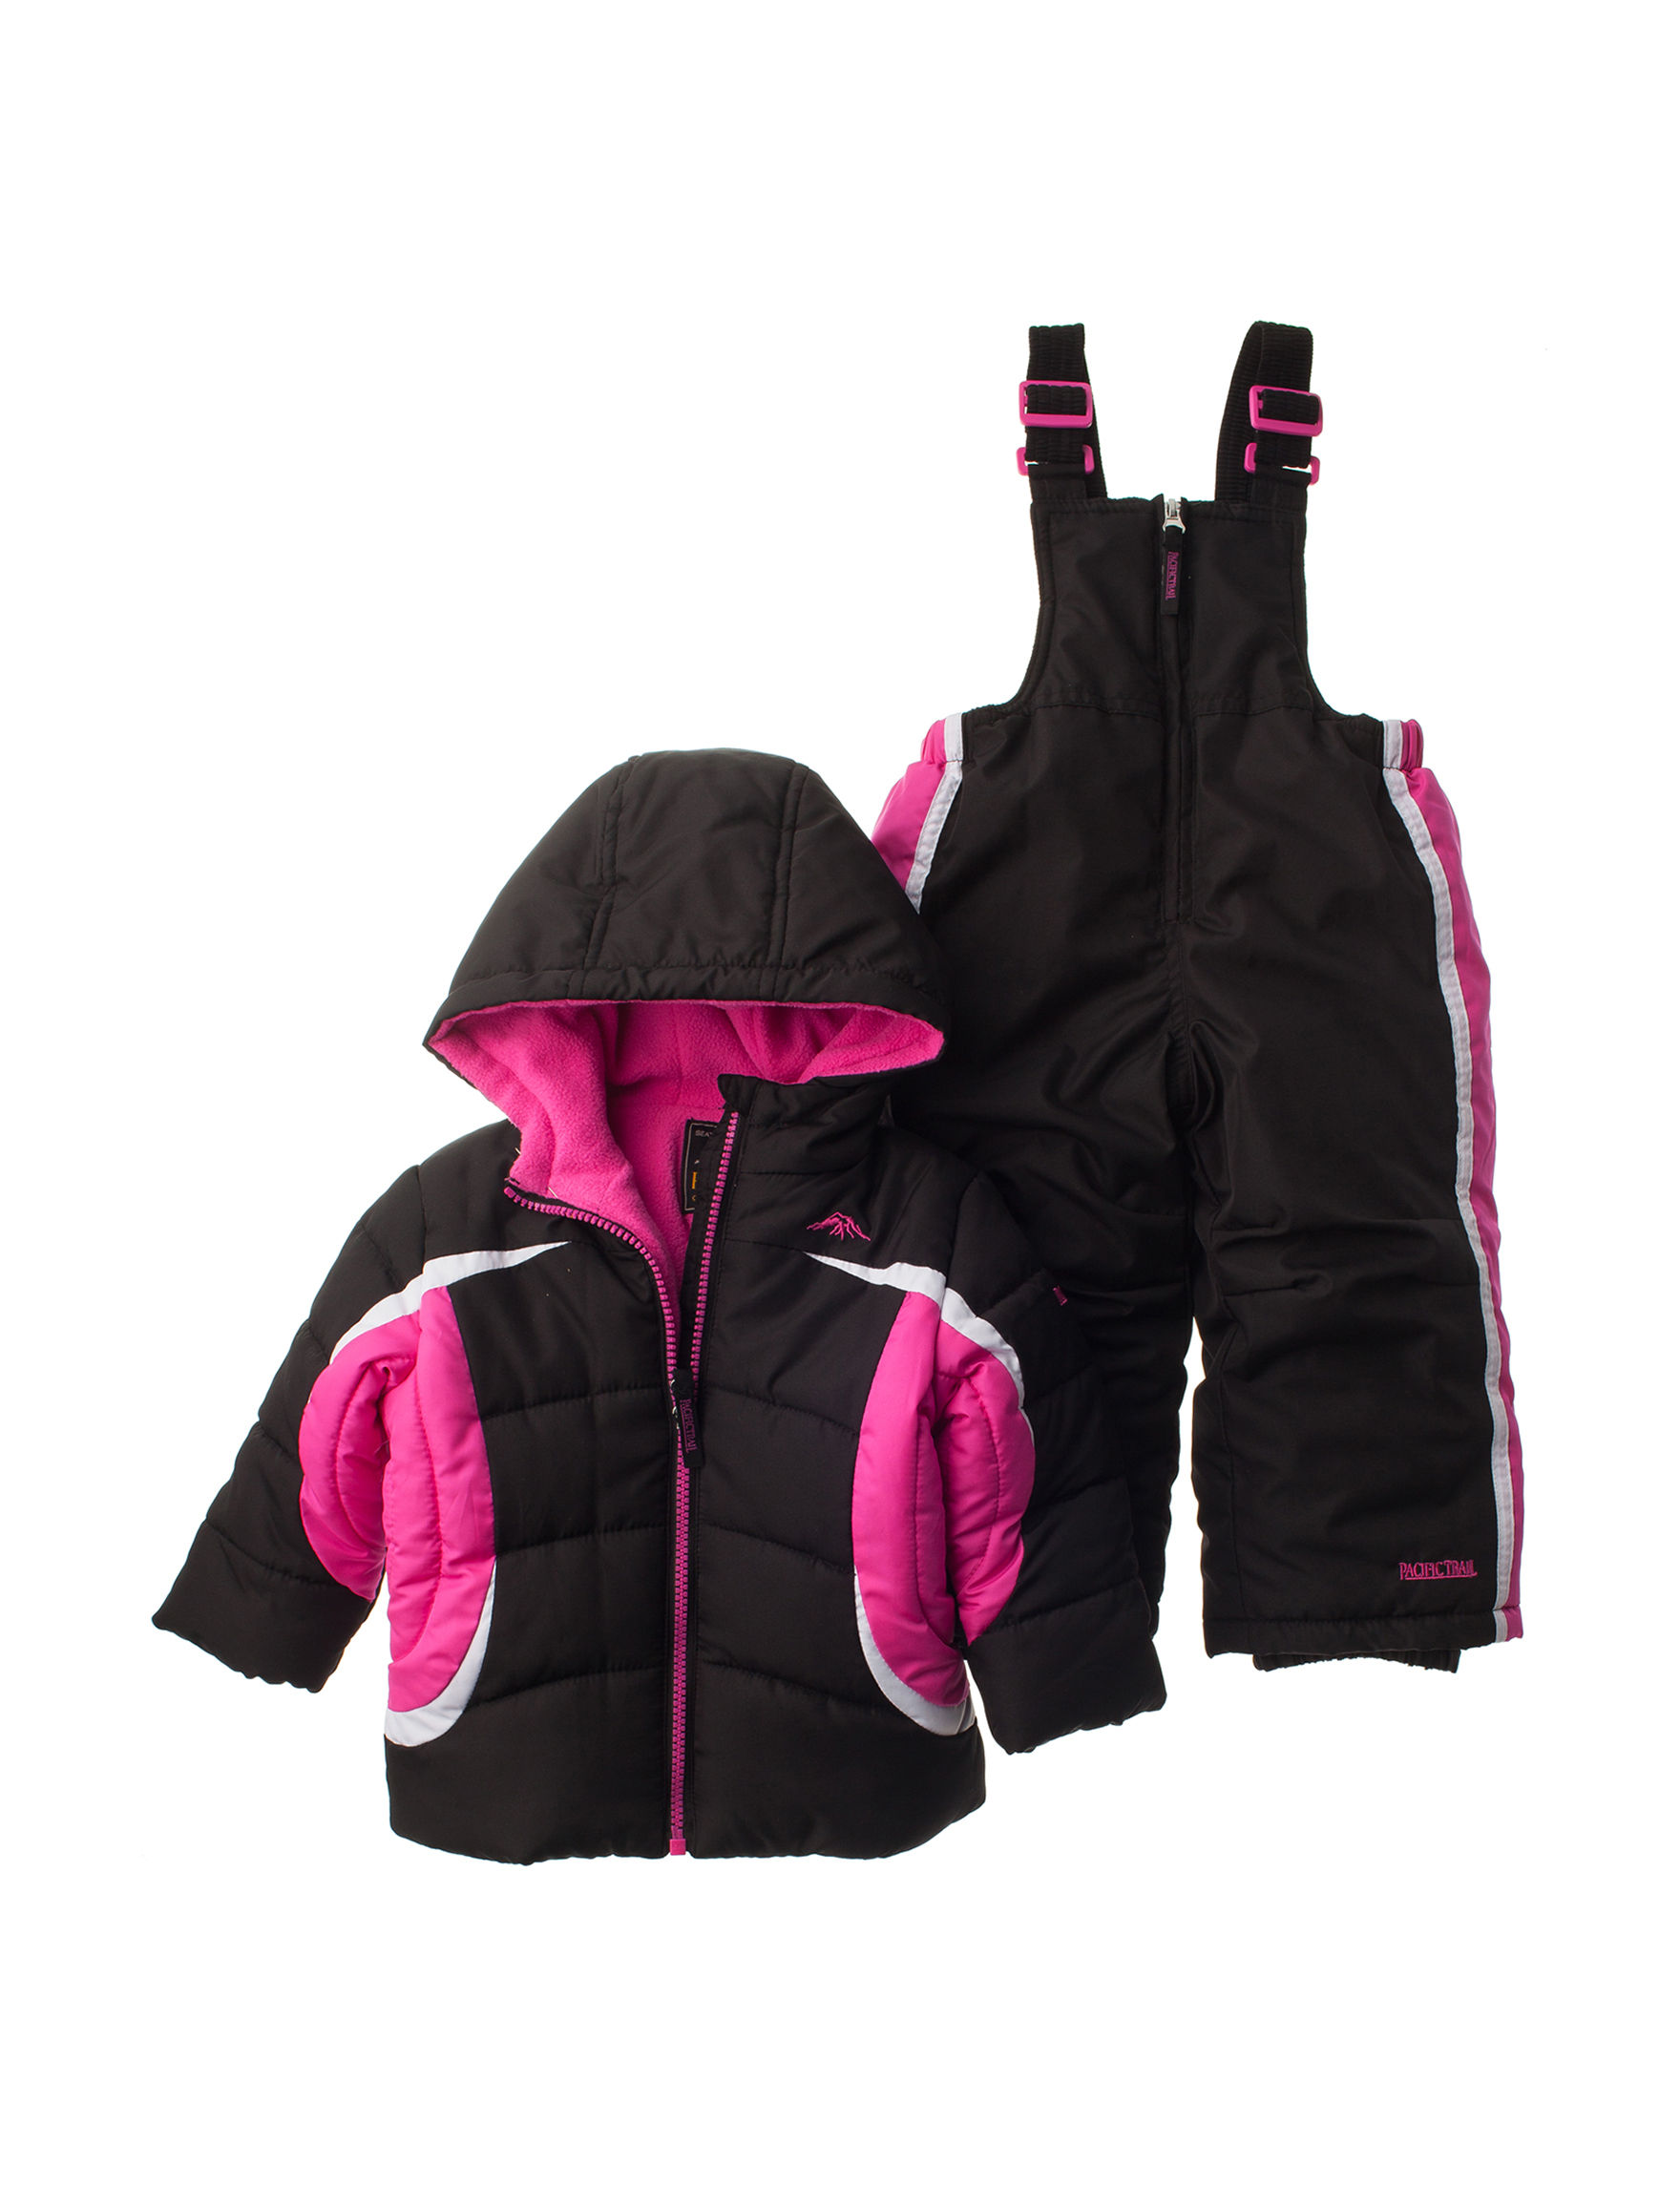 Pacific Trail Black Lightweight Jackets & Blazers